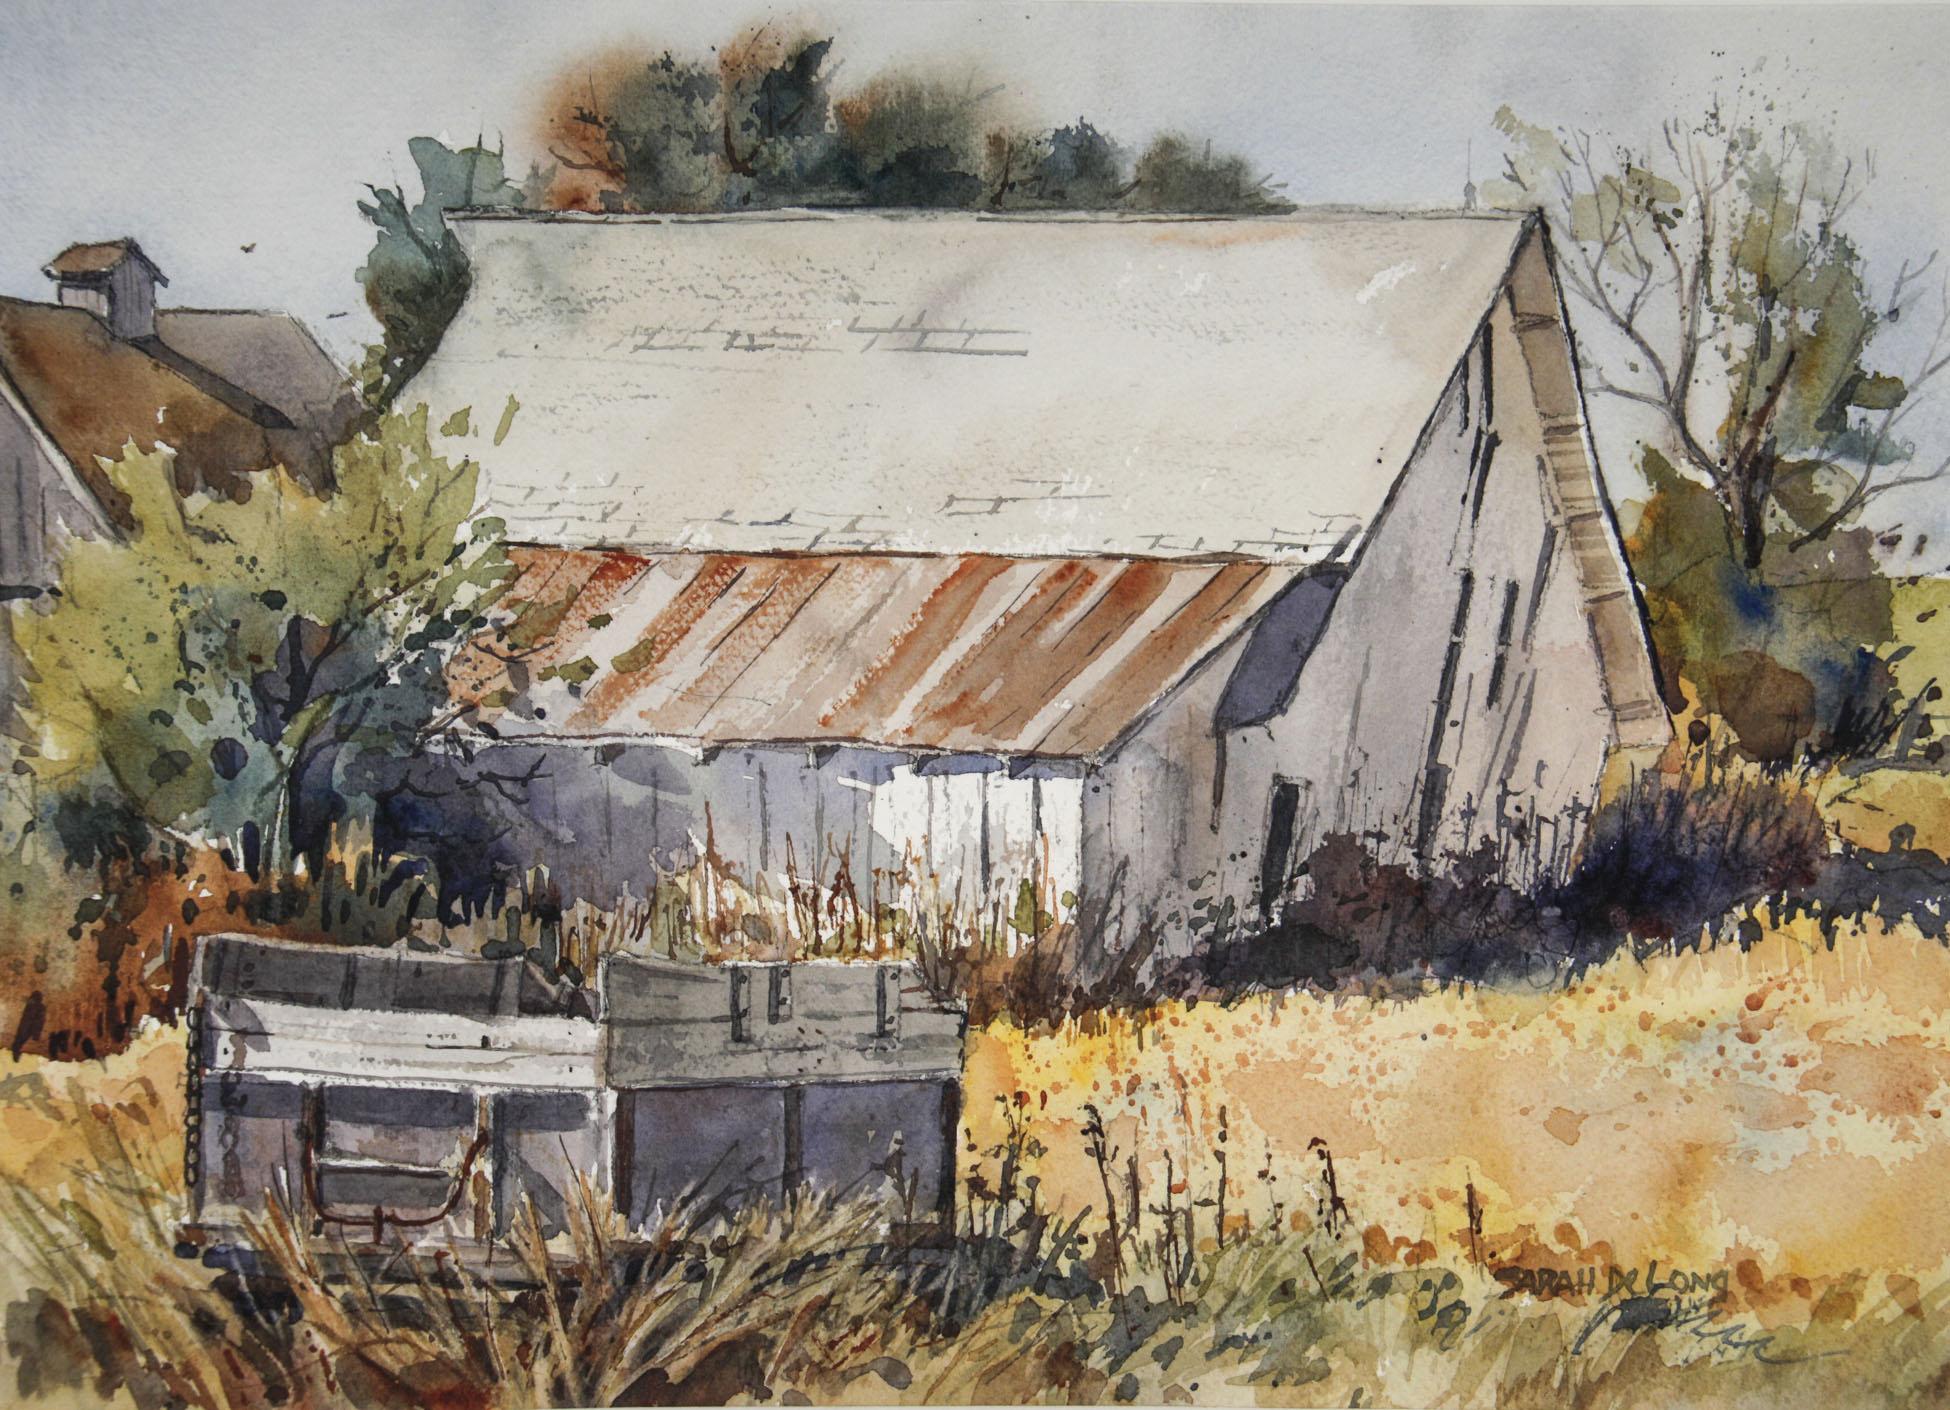 White Barn and Wagon